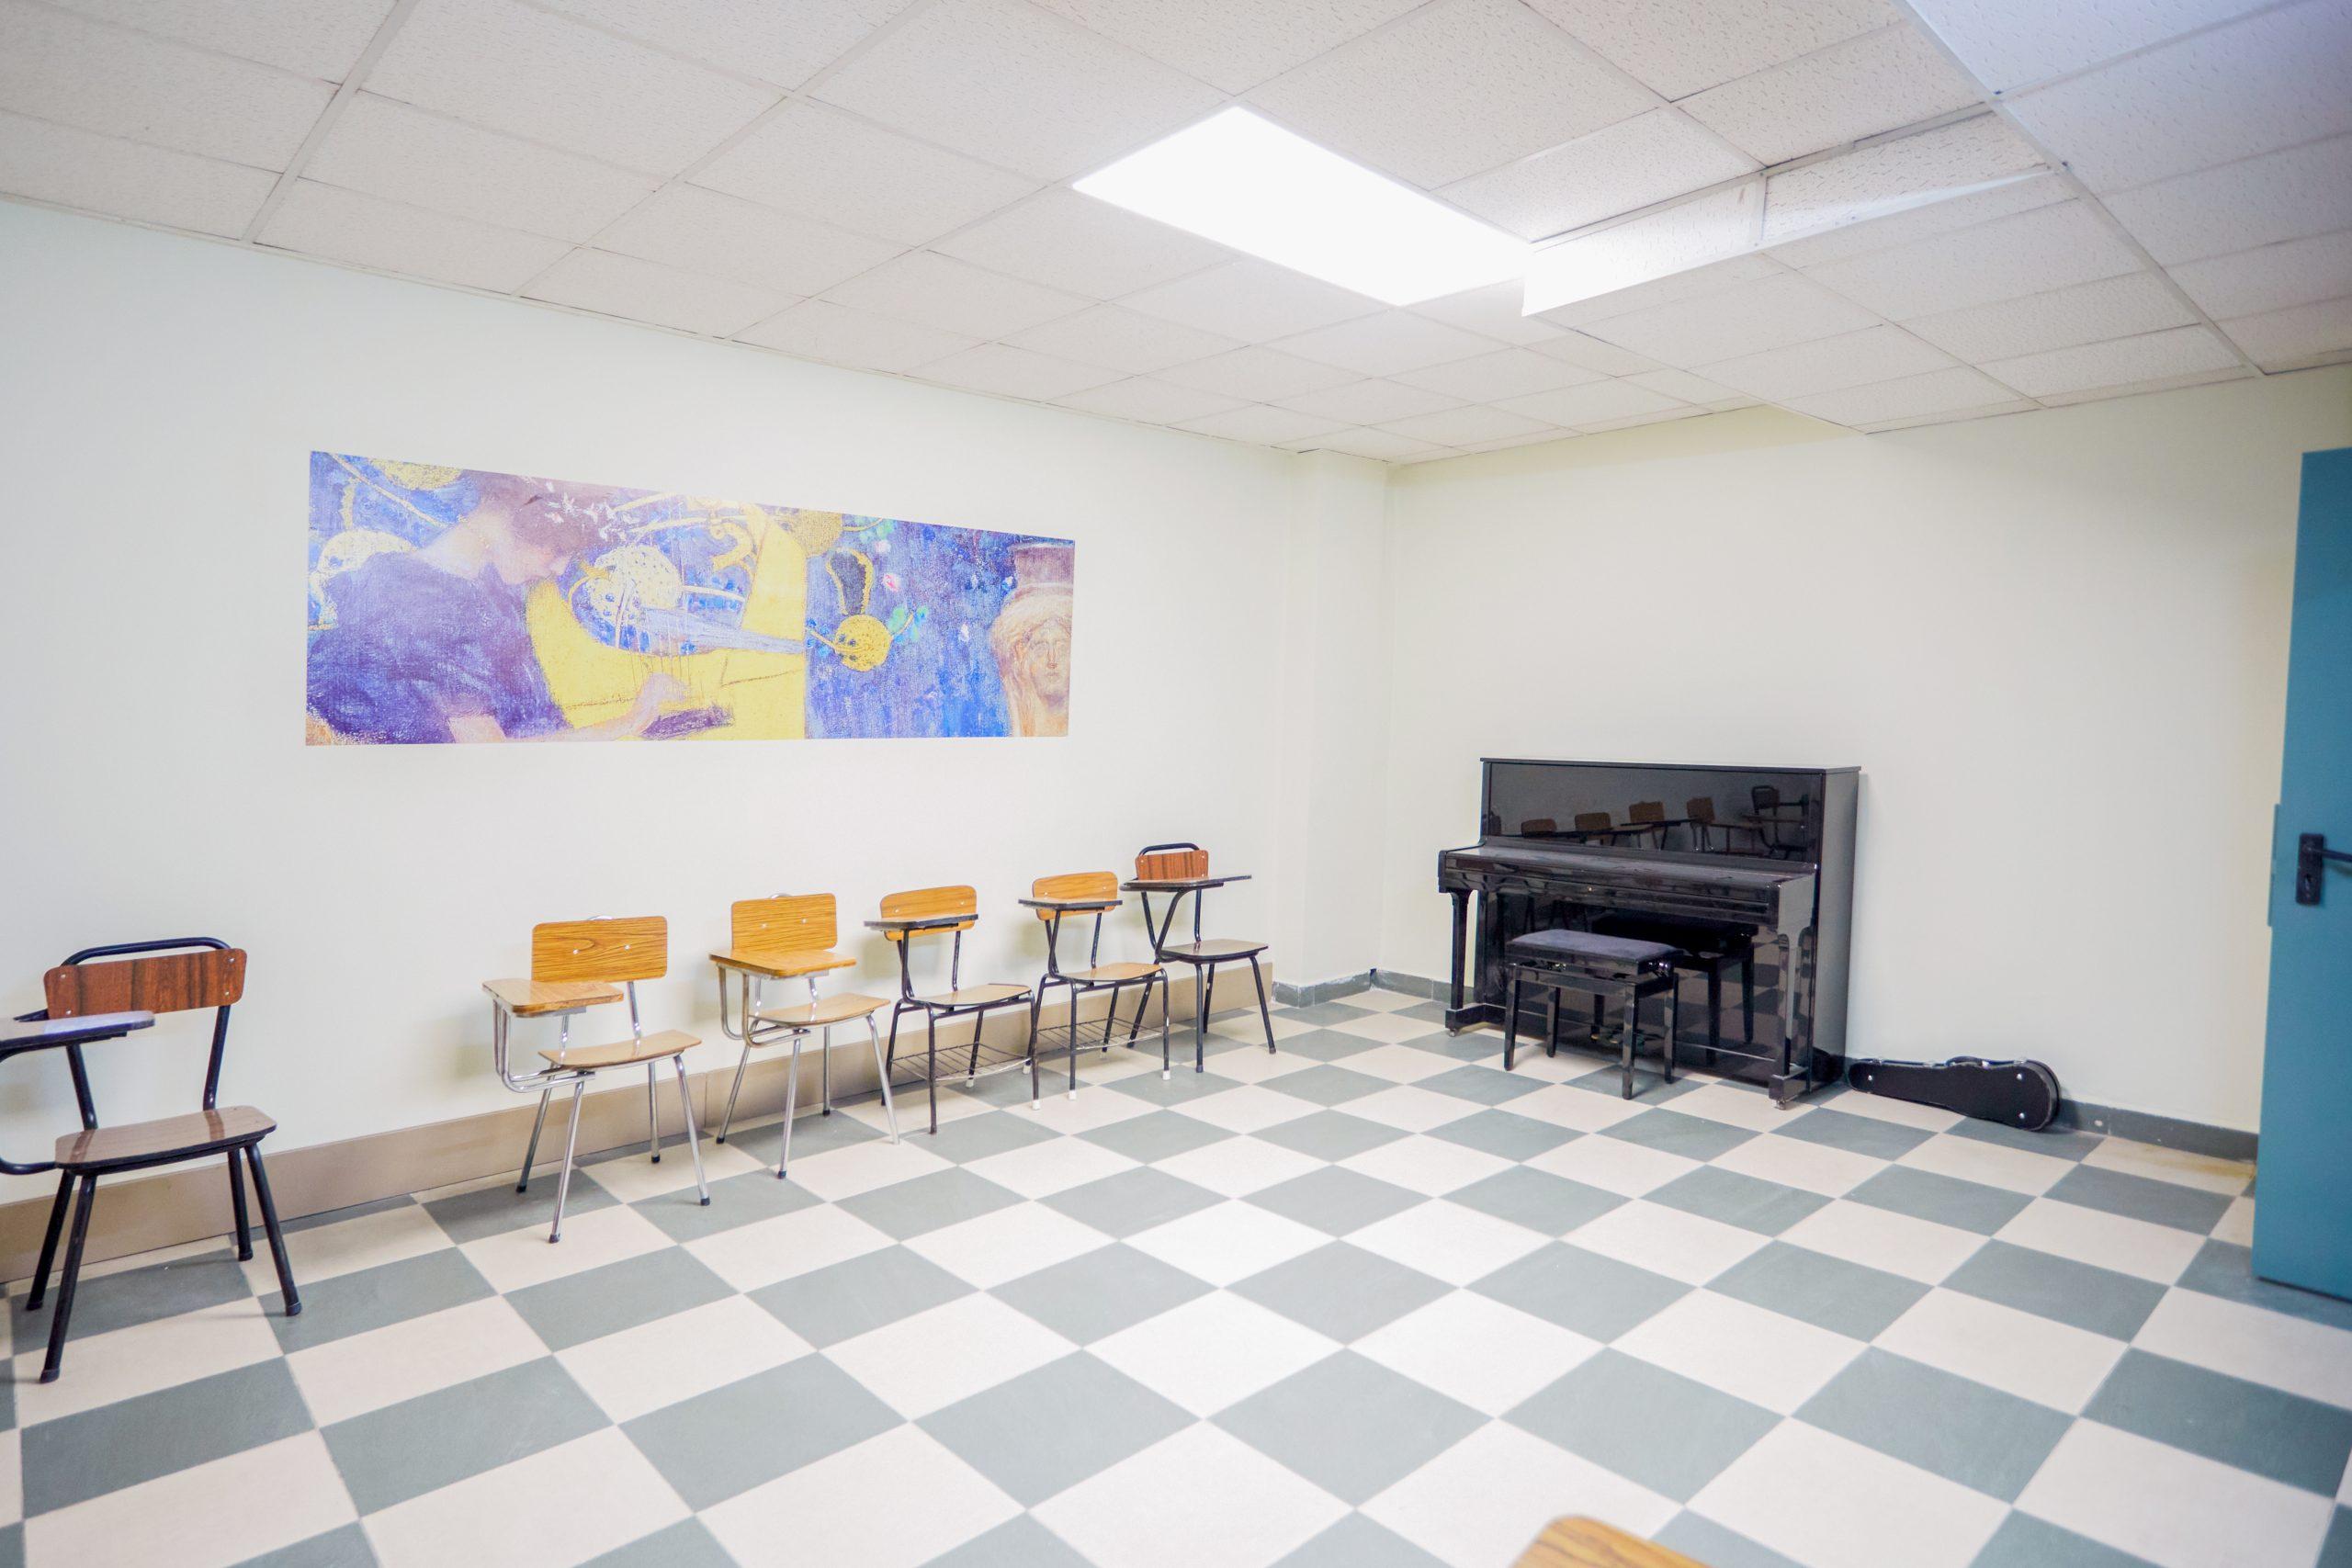 Aula Mediana - Alquiler de Espacios - Tempo Musical